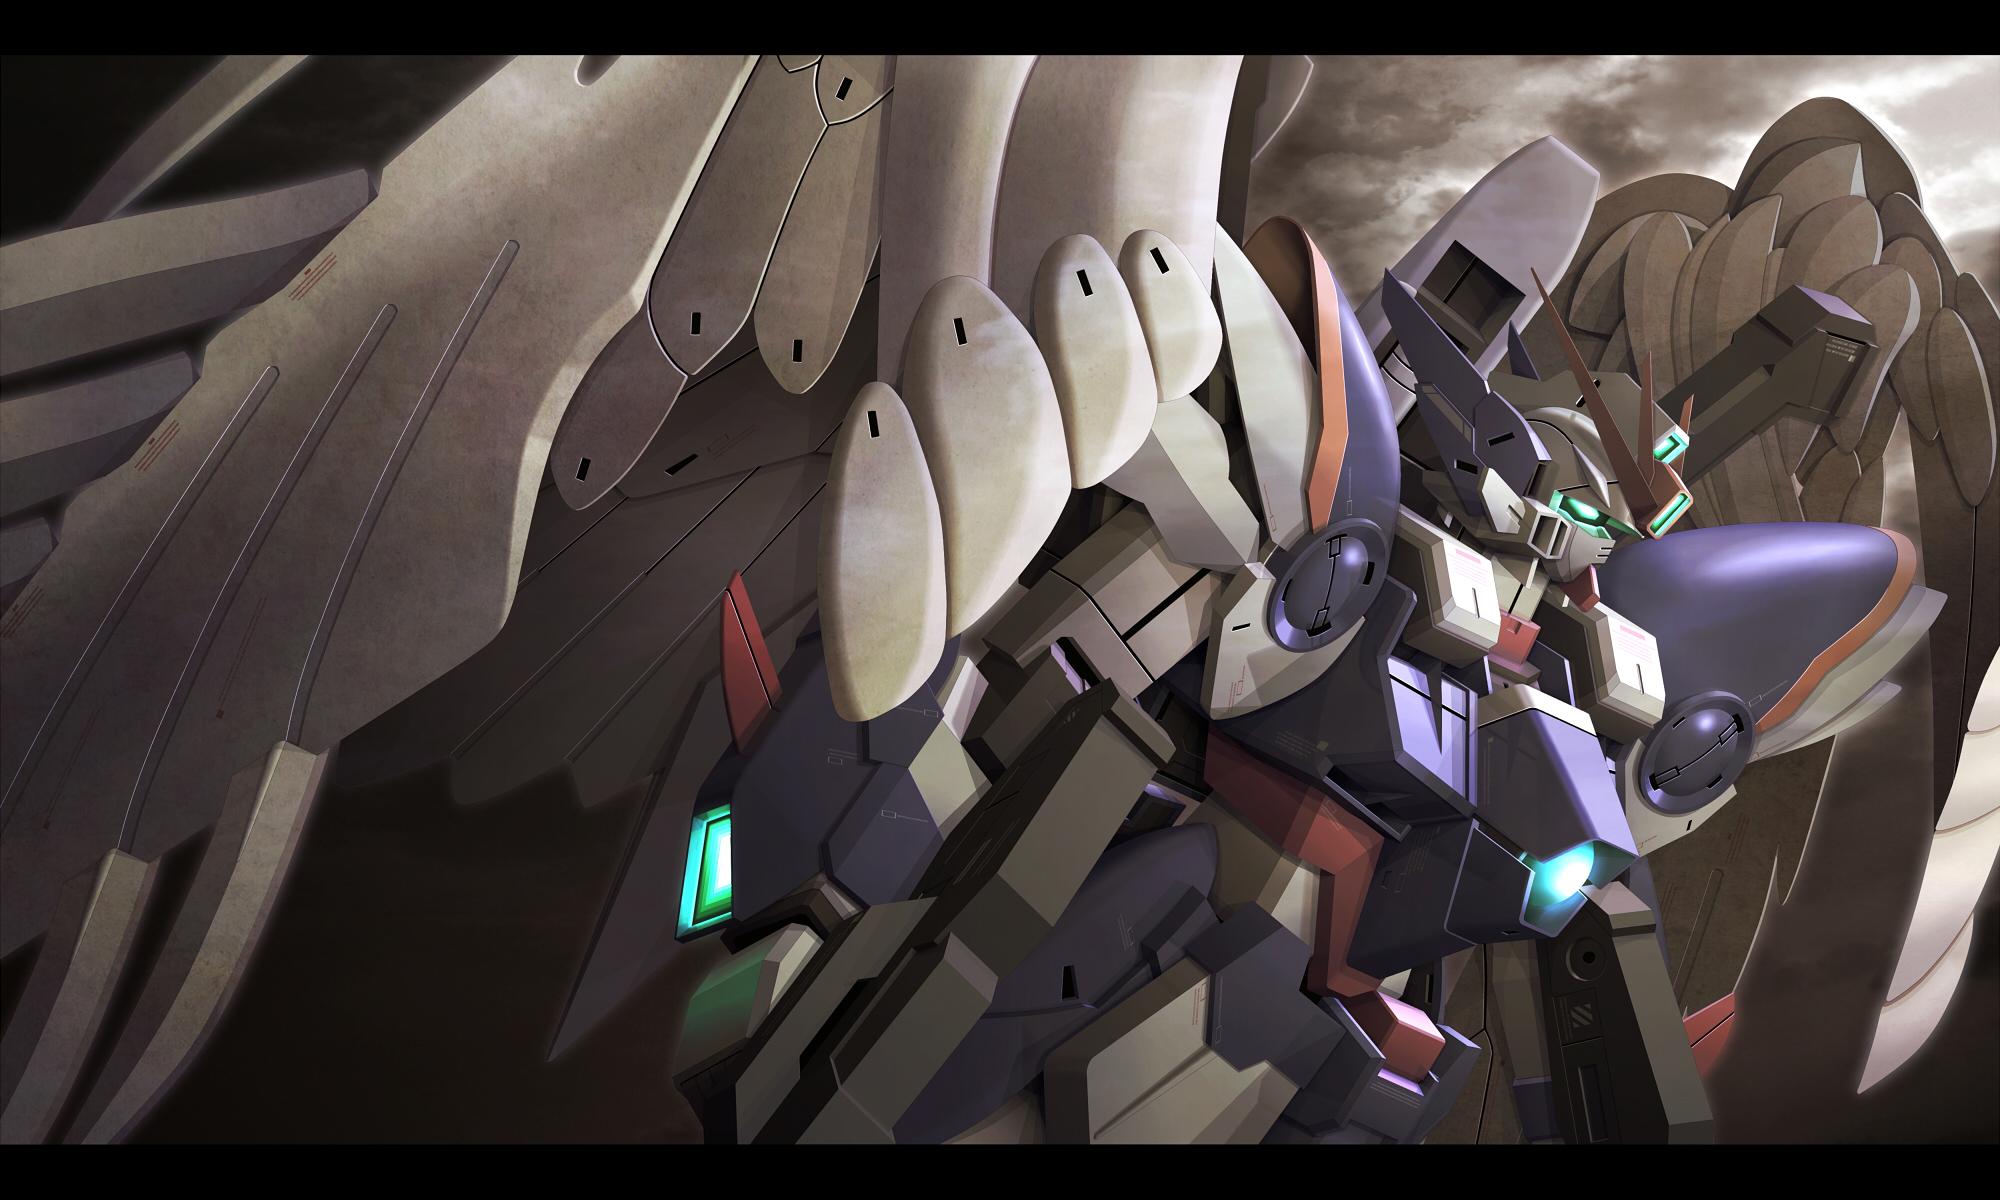 Mobile Suit Gundam Wing Wallpaper Zerochan Anime Image Board